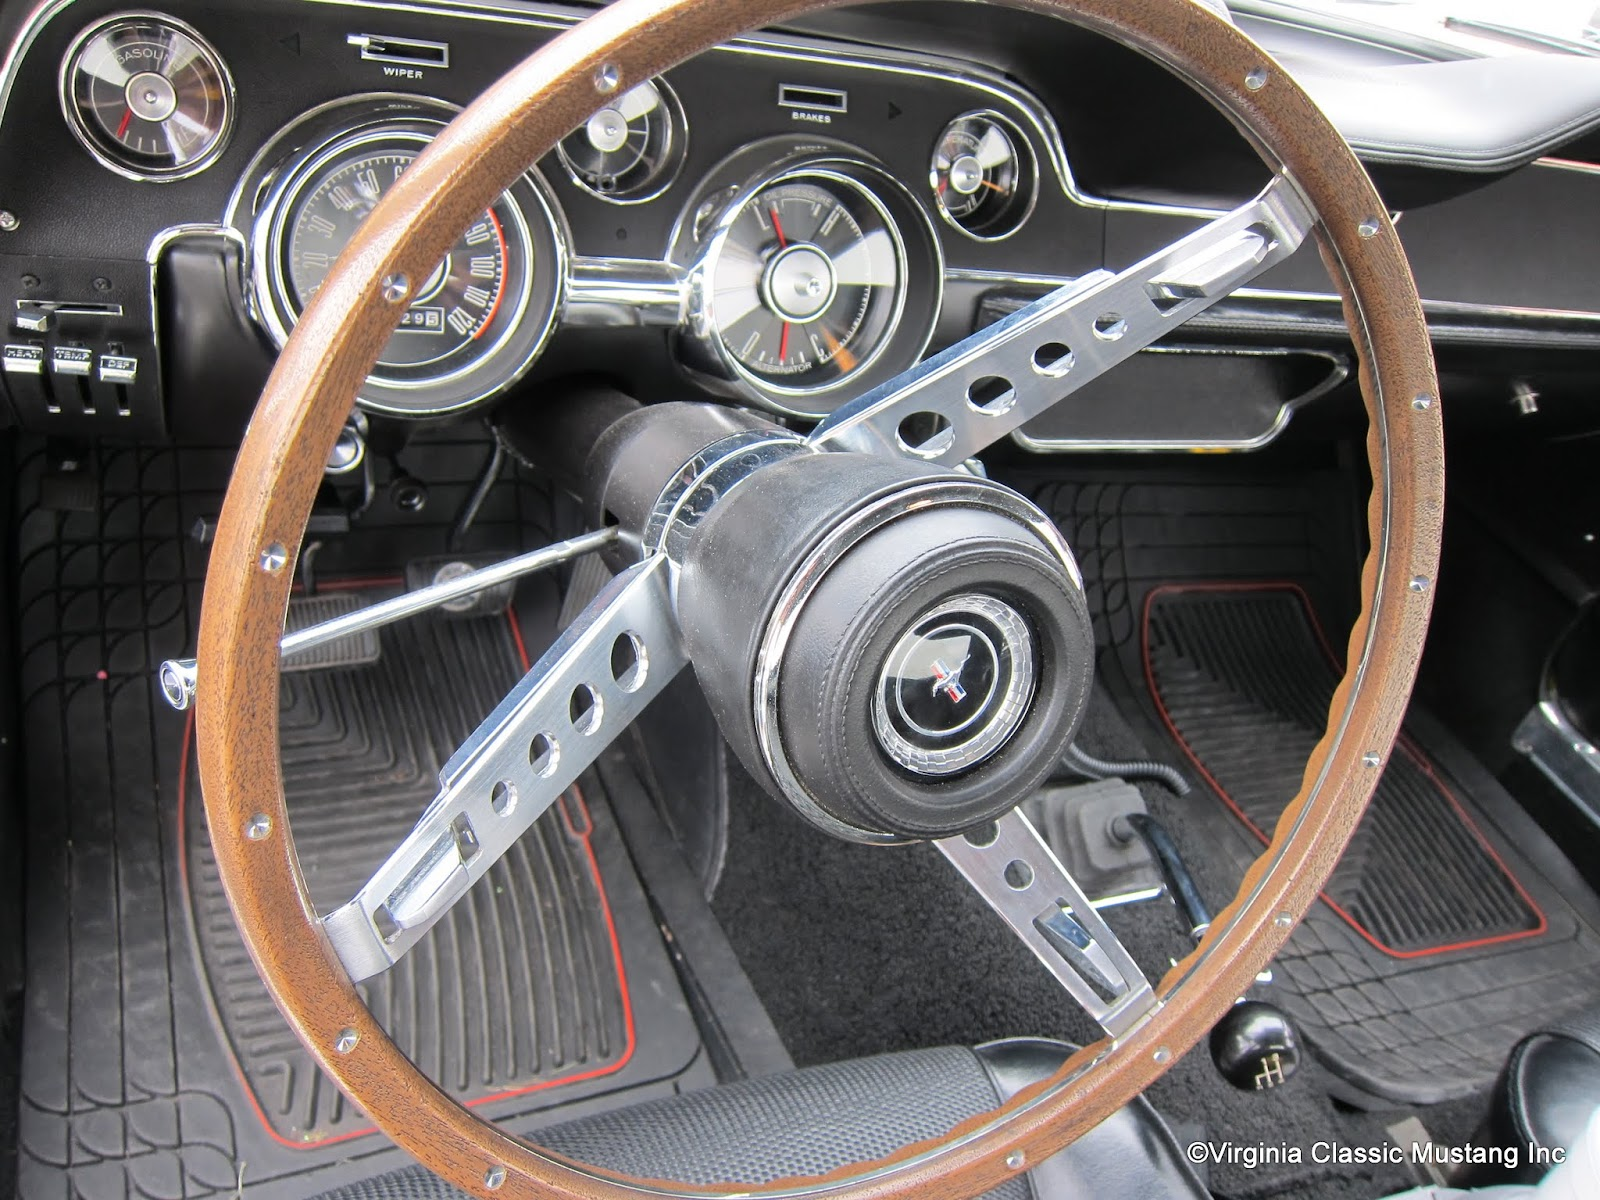 1967 Ford Falcon Steering Diagrams Data Wiring 1969 Ranchero Diagram 1965 Mustang Deluxe Wheel Download U2022 Rh Osomeweb Com 1966